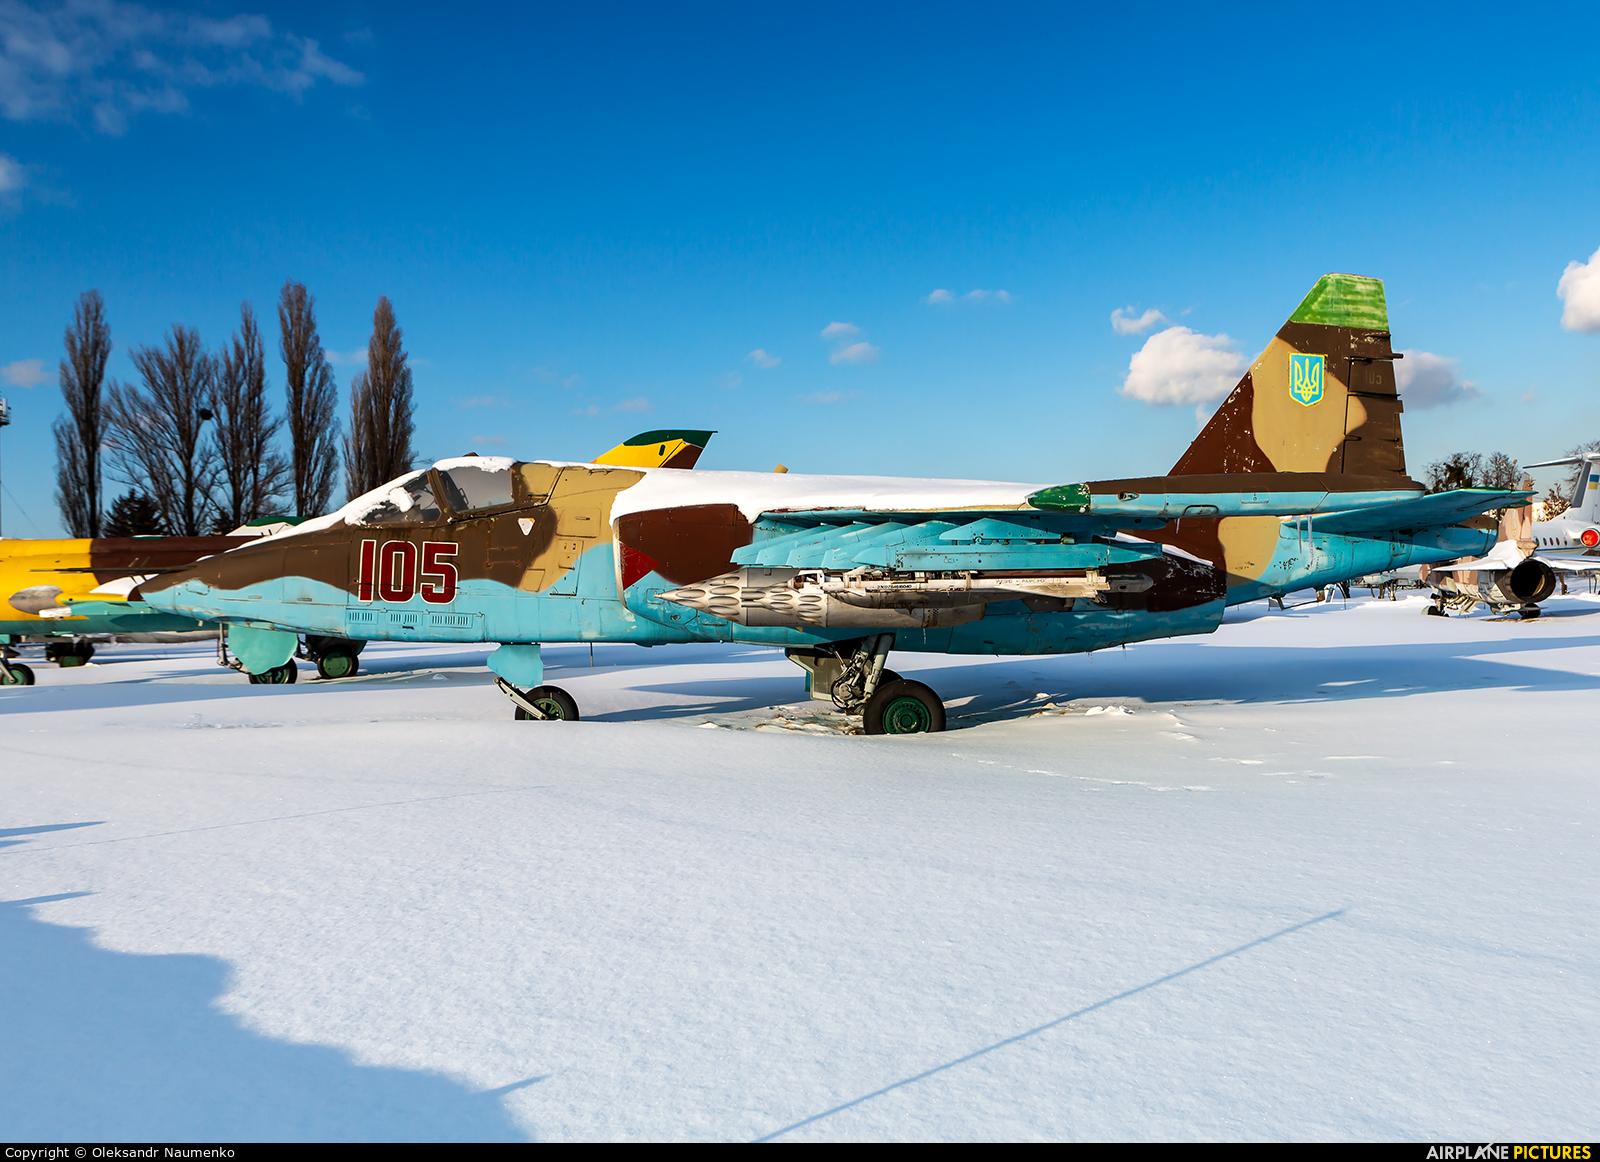 Ukraine - Air Force 105 aircraft at Kyiv - Zhulyany State Aviation Museum